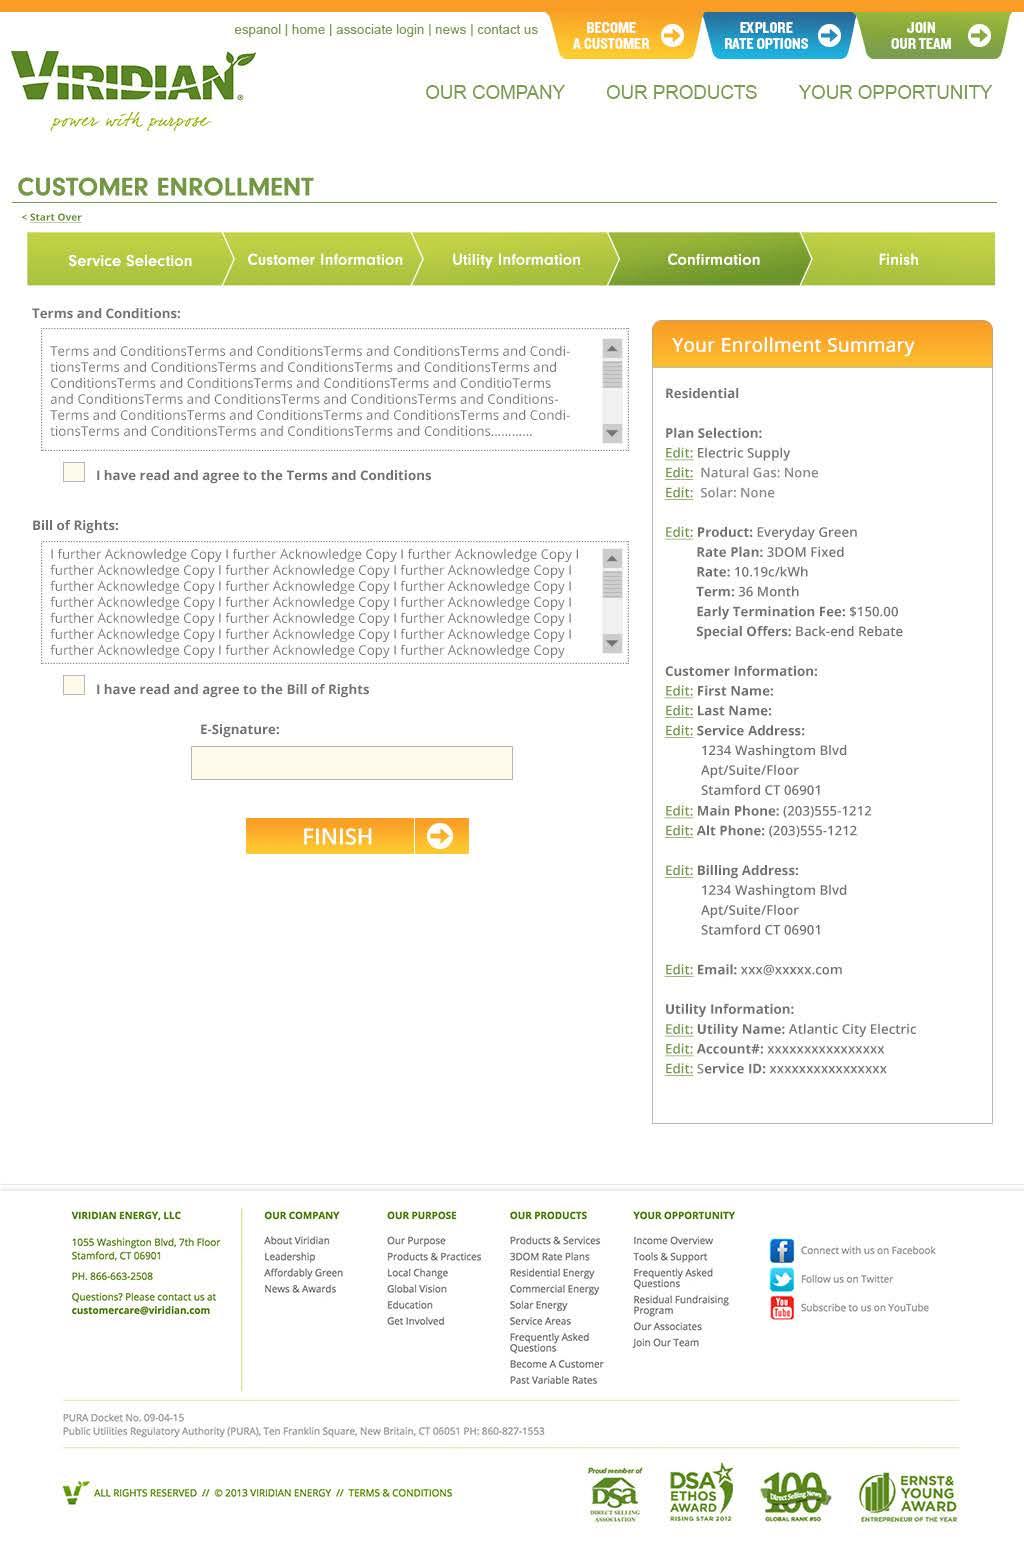 Customer Enrollment Screens 04282015_Page_09